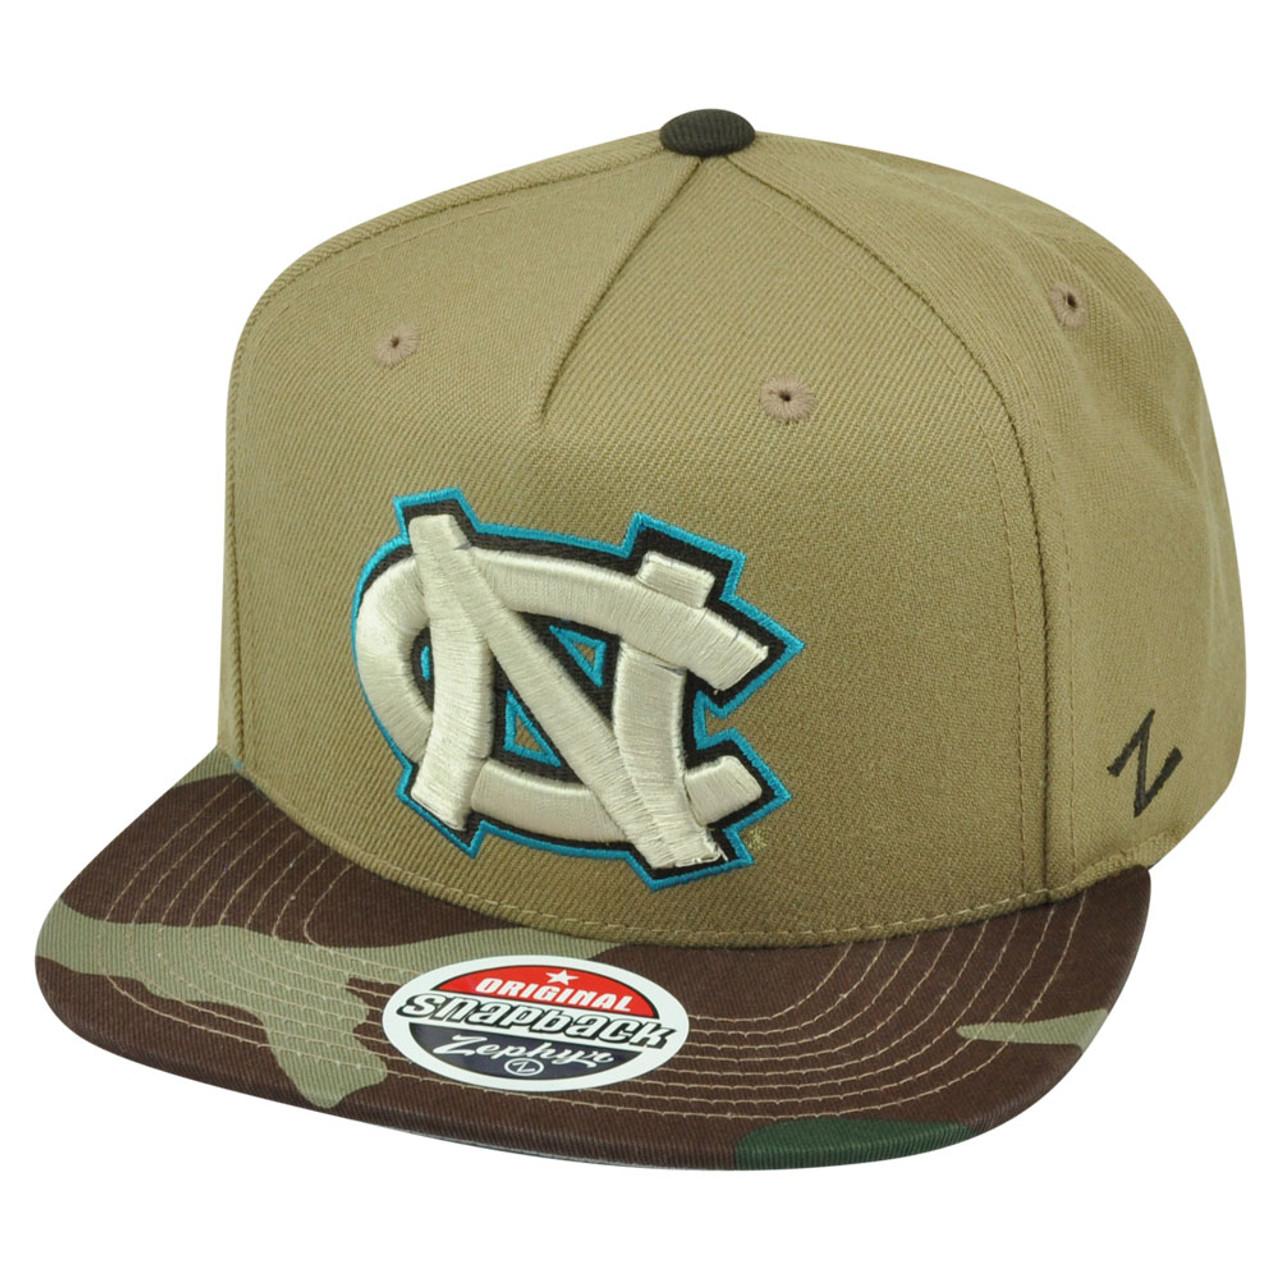 66e6b49b15 NCAA Zephyr North Carolina Tar Heels Zuni 5 Panel Camouflage Snapback Hat  Cap